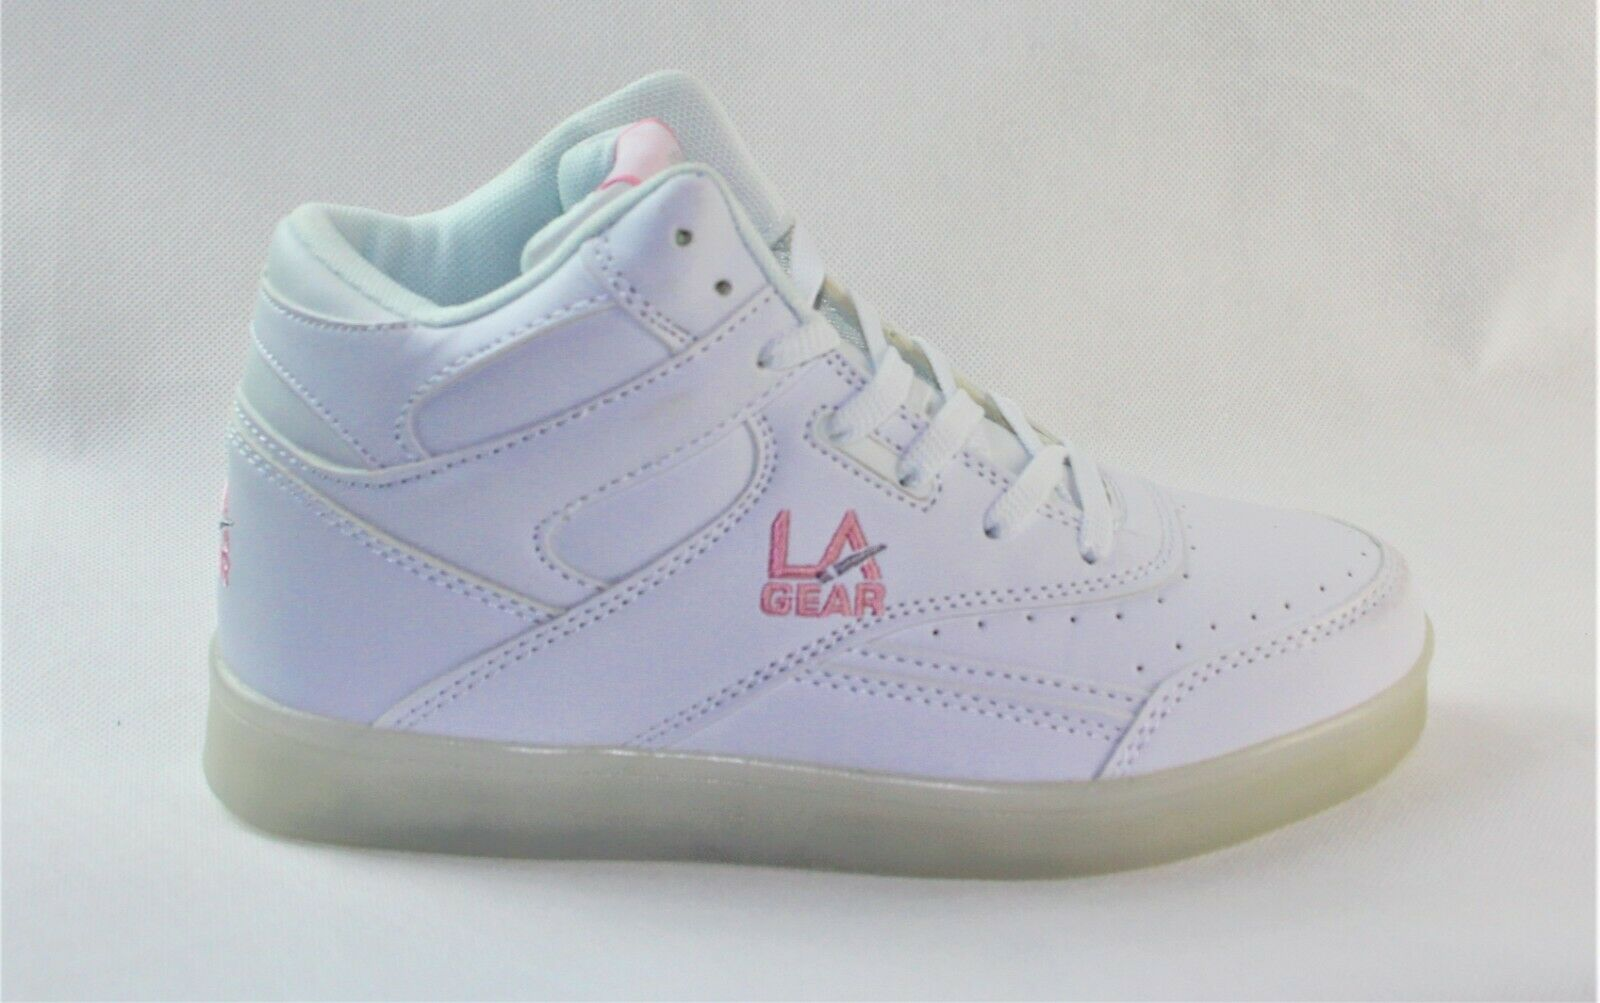 LA GEAR FLO Lights Schuhe LED Lichtschuhe Sneaker Turnschuhe